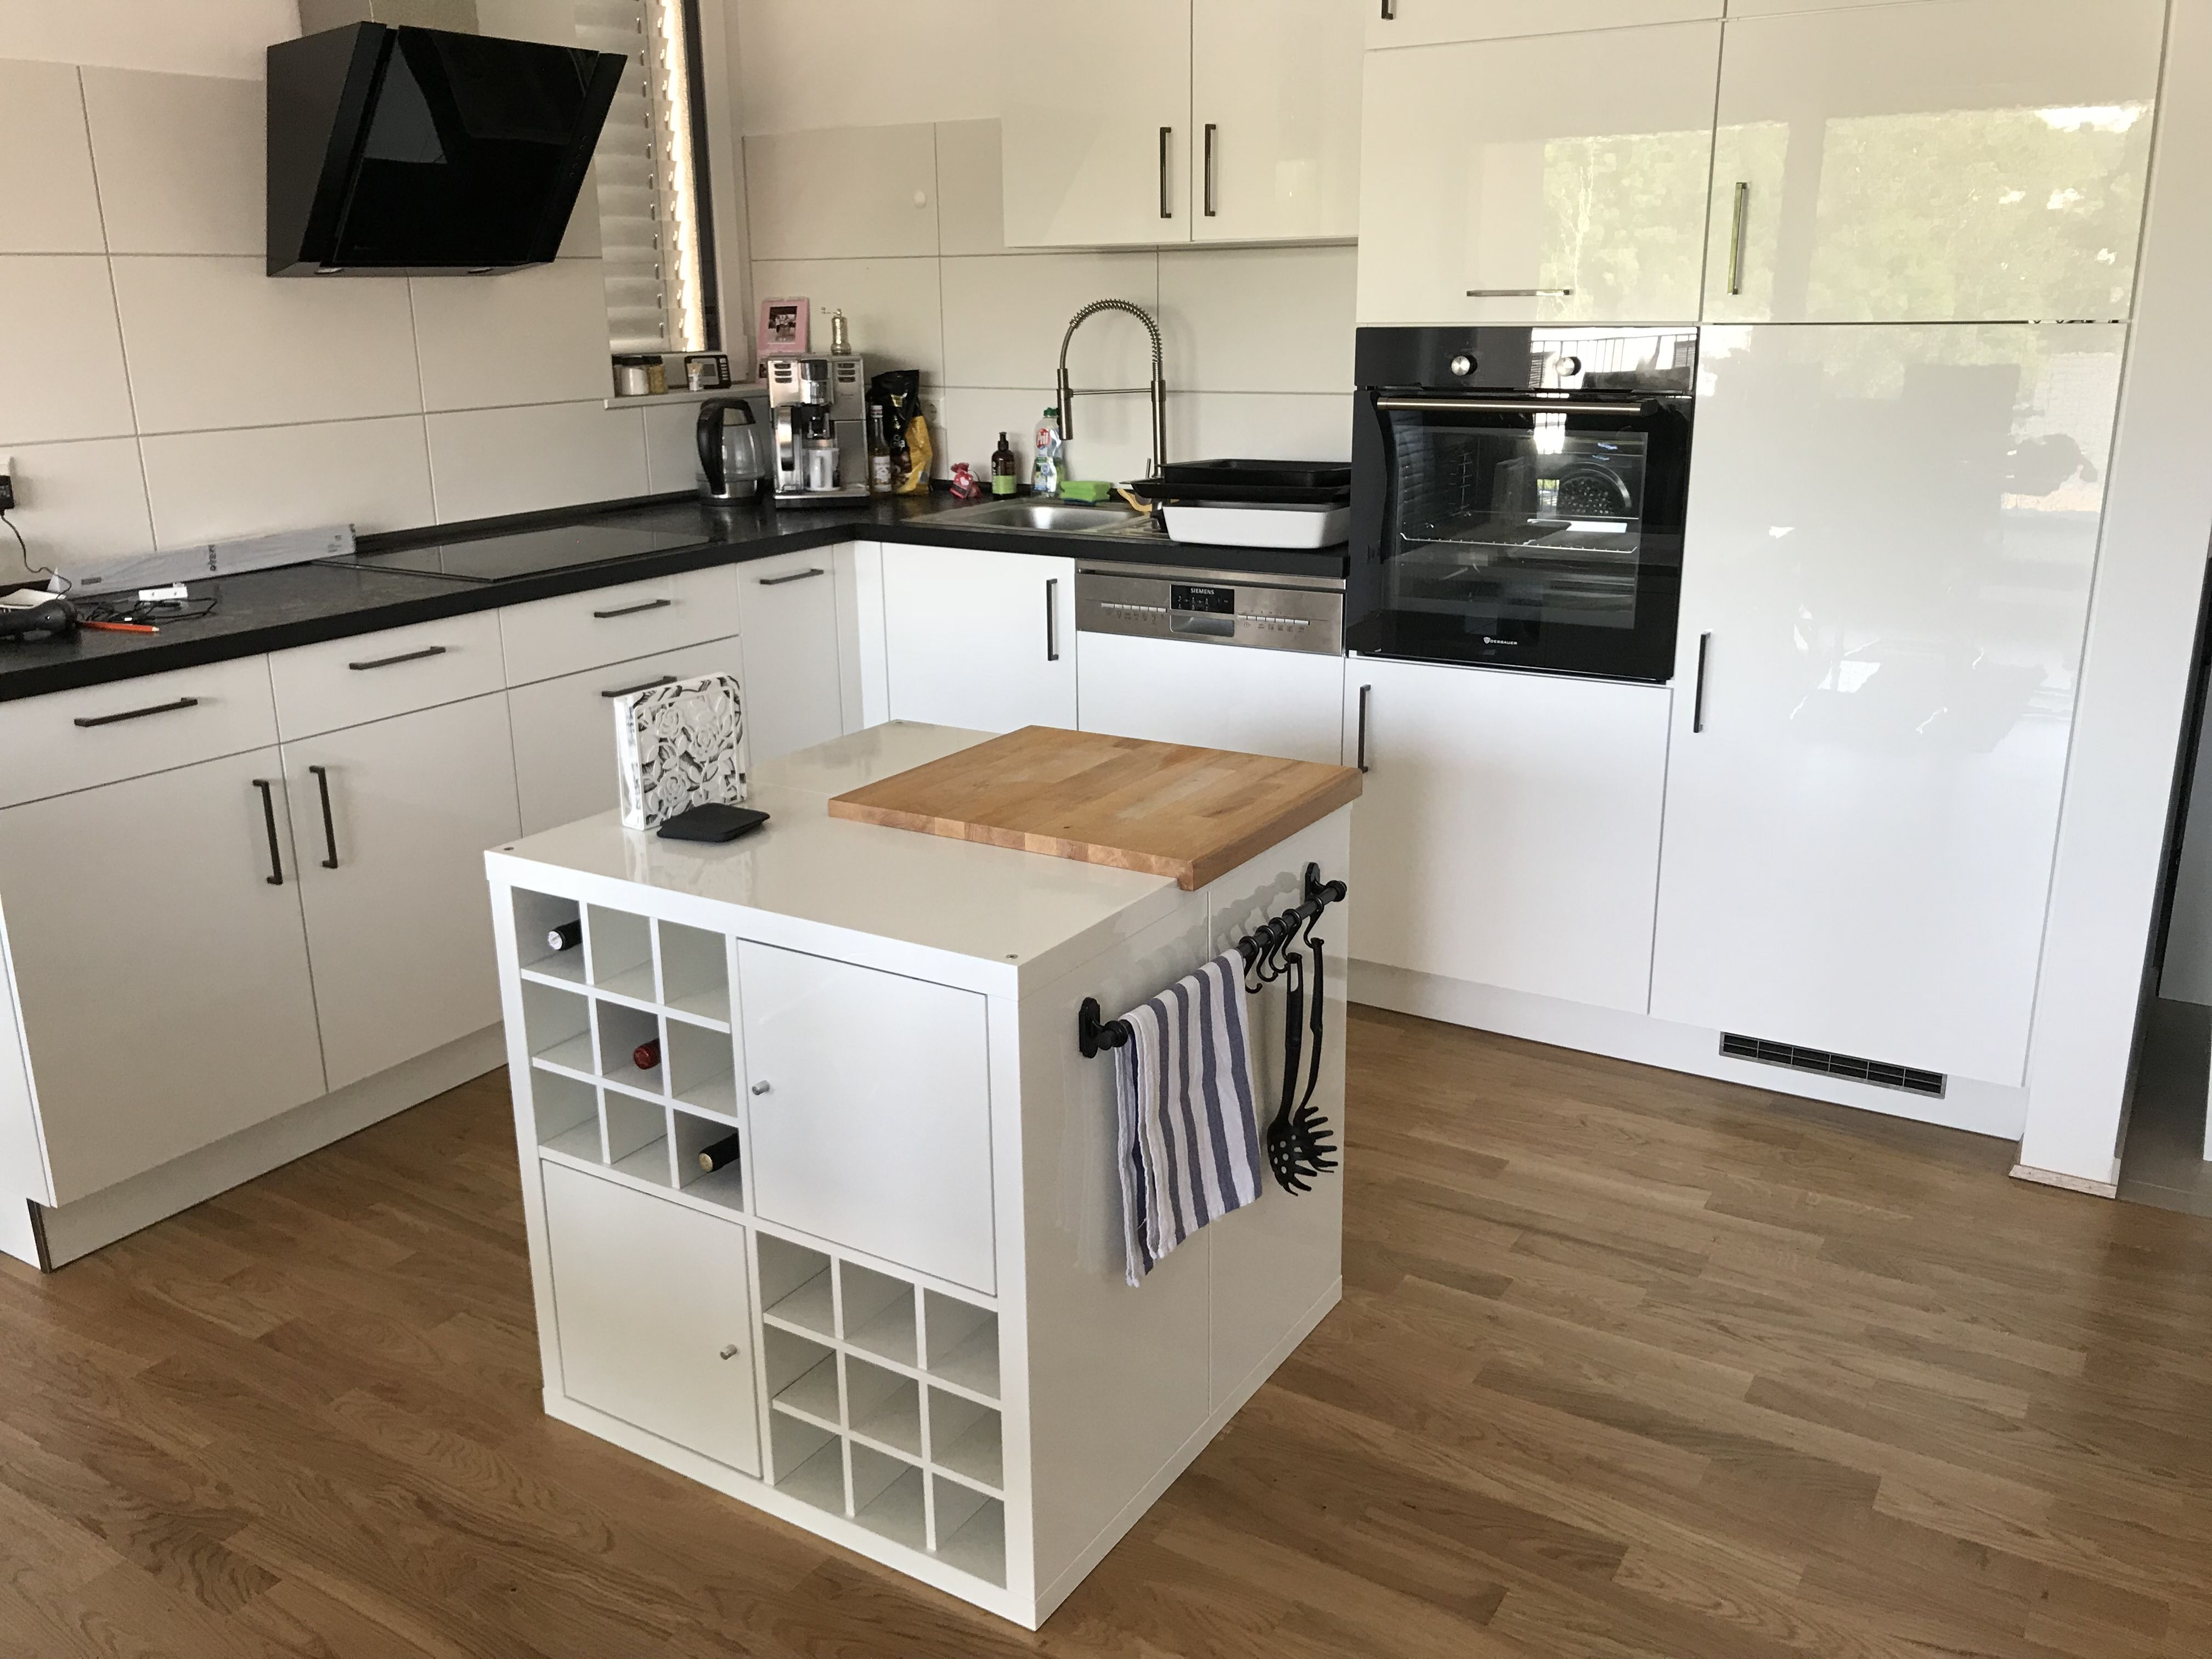 Ikea Kücheninsel In 2019 Kücheninsel Ikea Küche Mit Insel